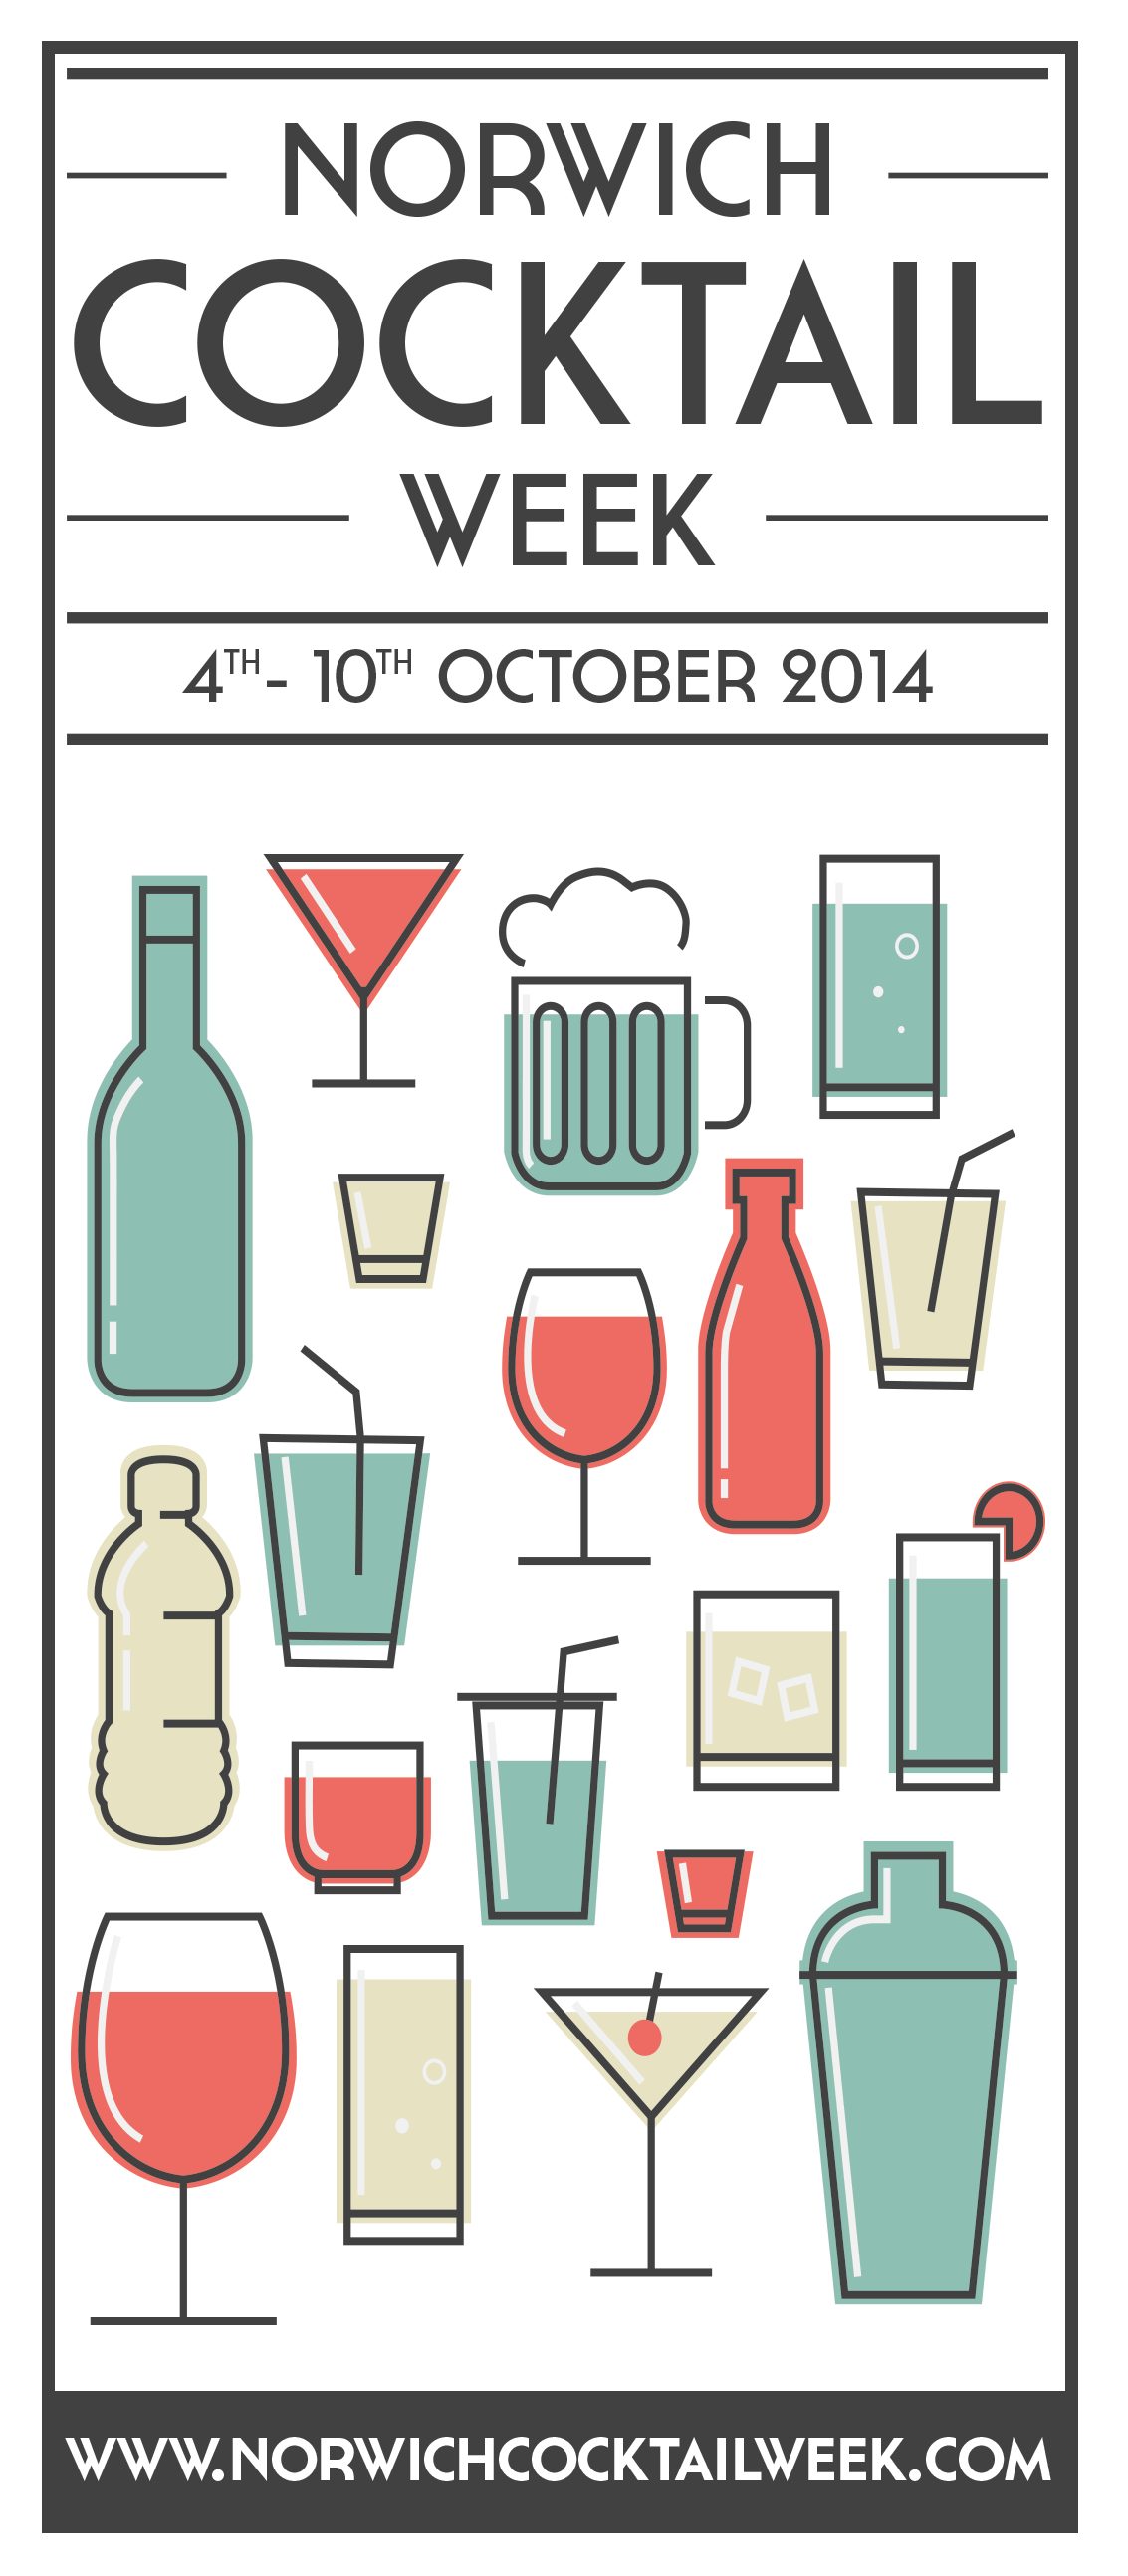 Norwich Cocktail Week